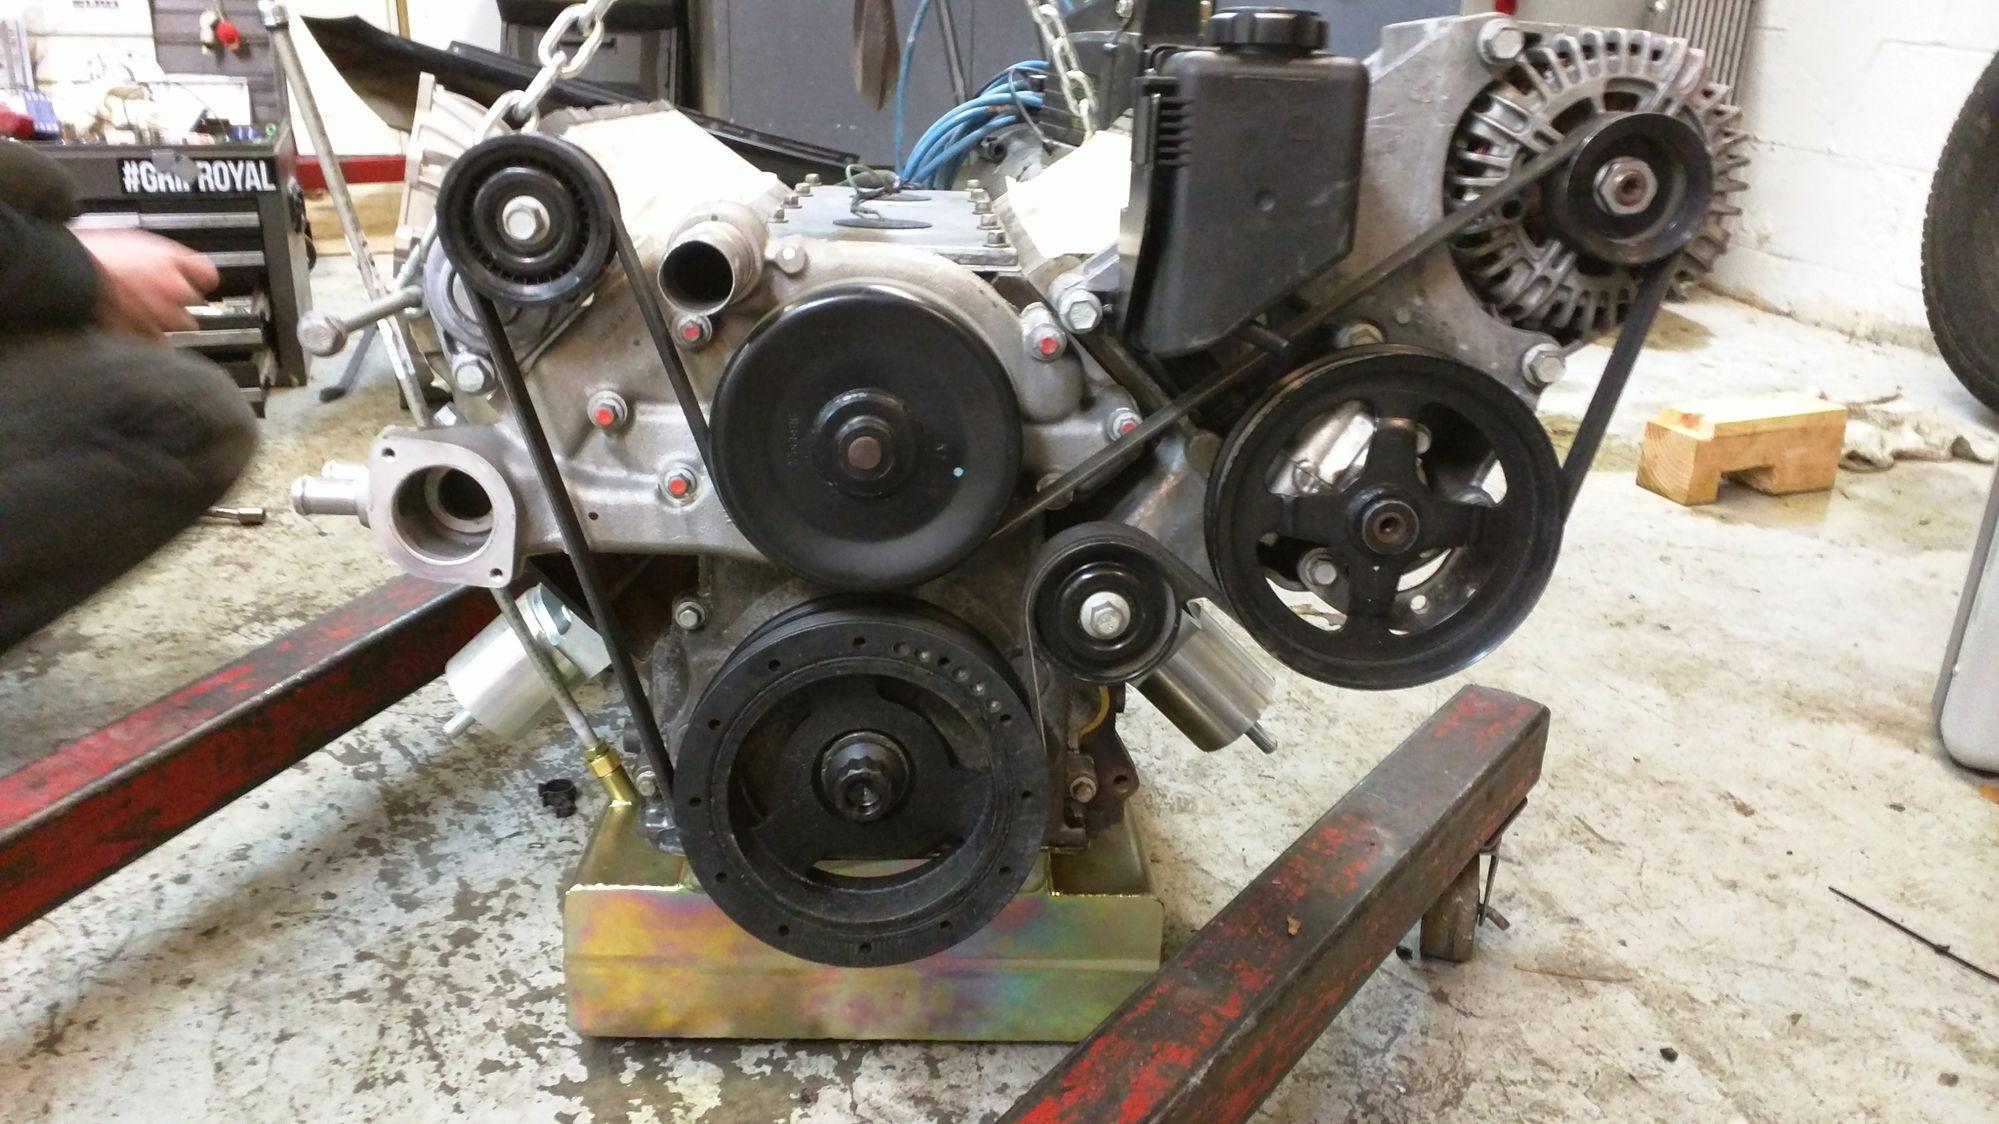 Gybn O E A F A Bfa E A Ec Af Dd Ecfd on Cadillac Cts V Ls6 Engine